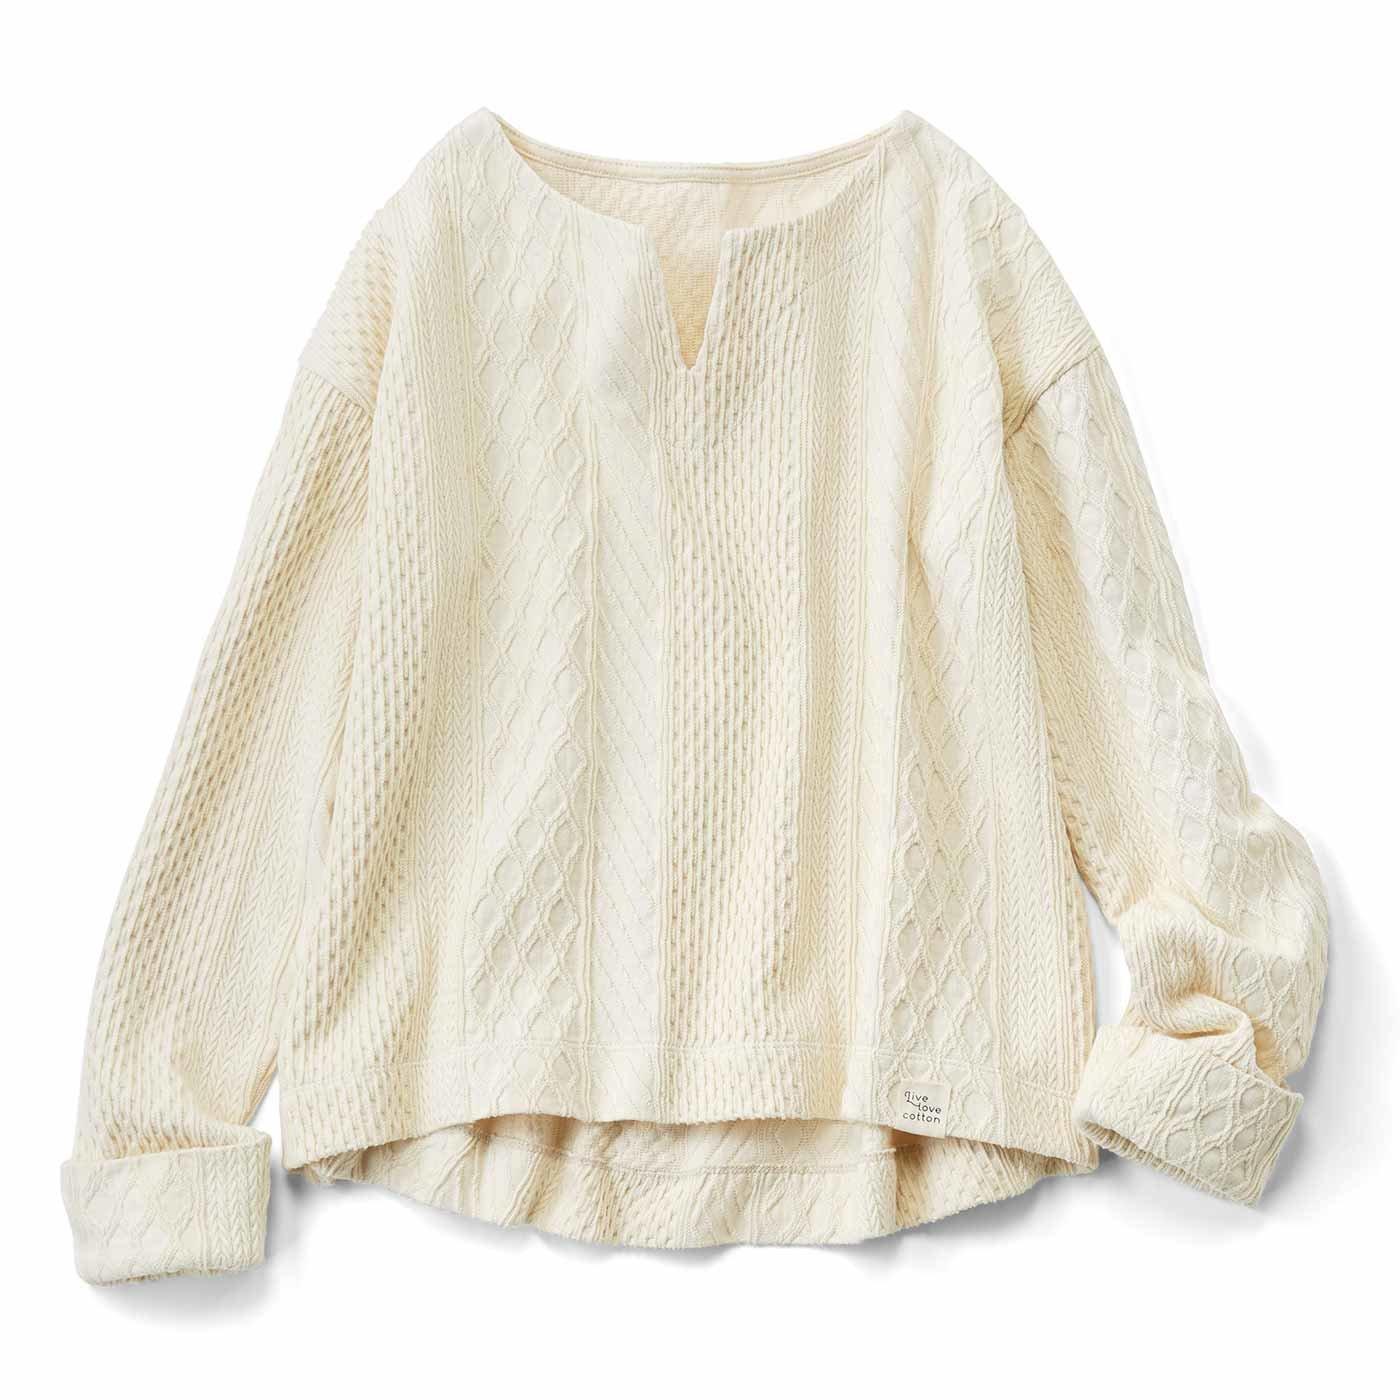 Live love cottonプロジェクト リブ イン コンフォート 柄編みが素敵な厚手オーガニックコットントップス〈アイボリー〉